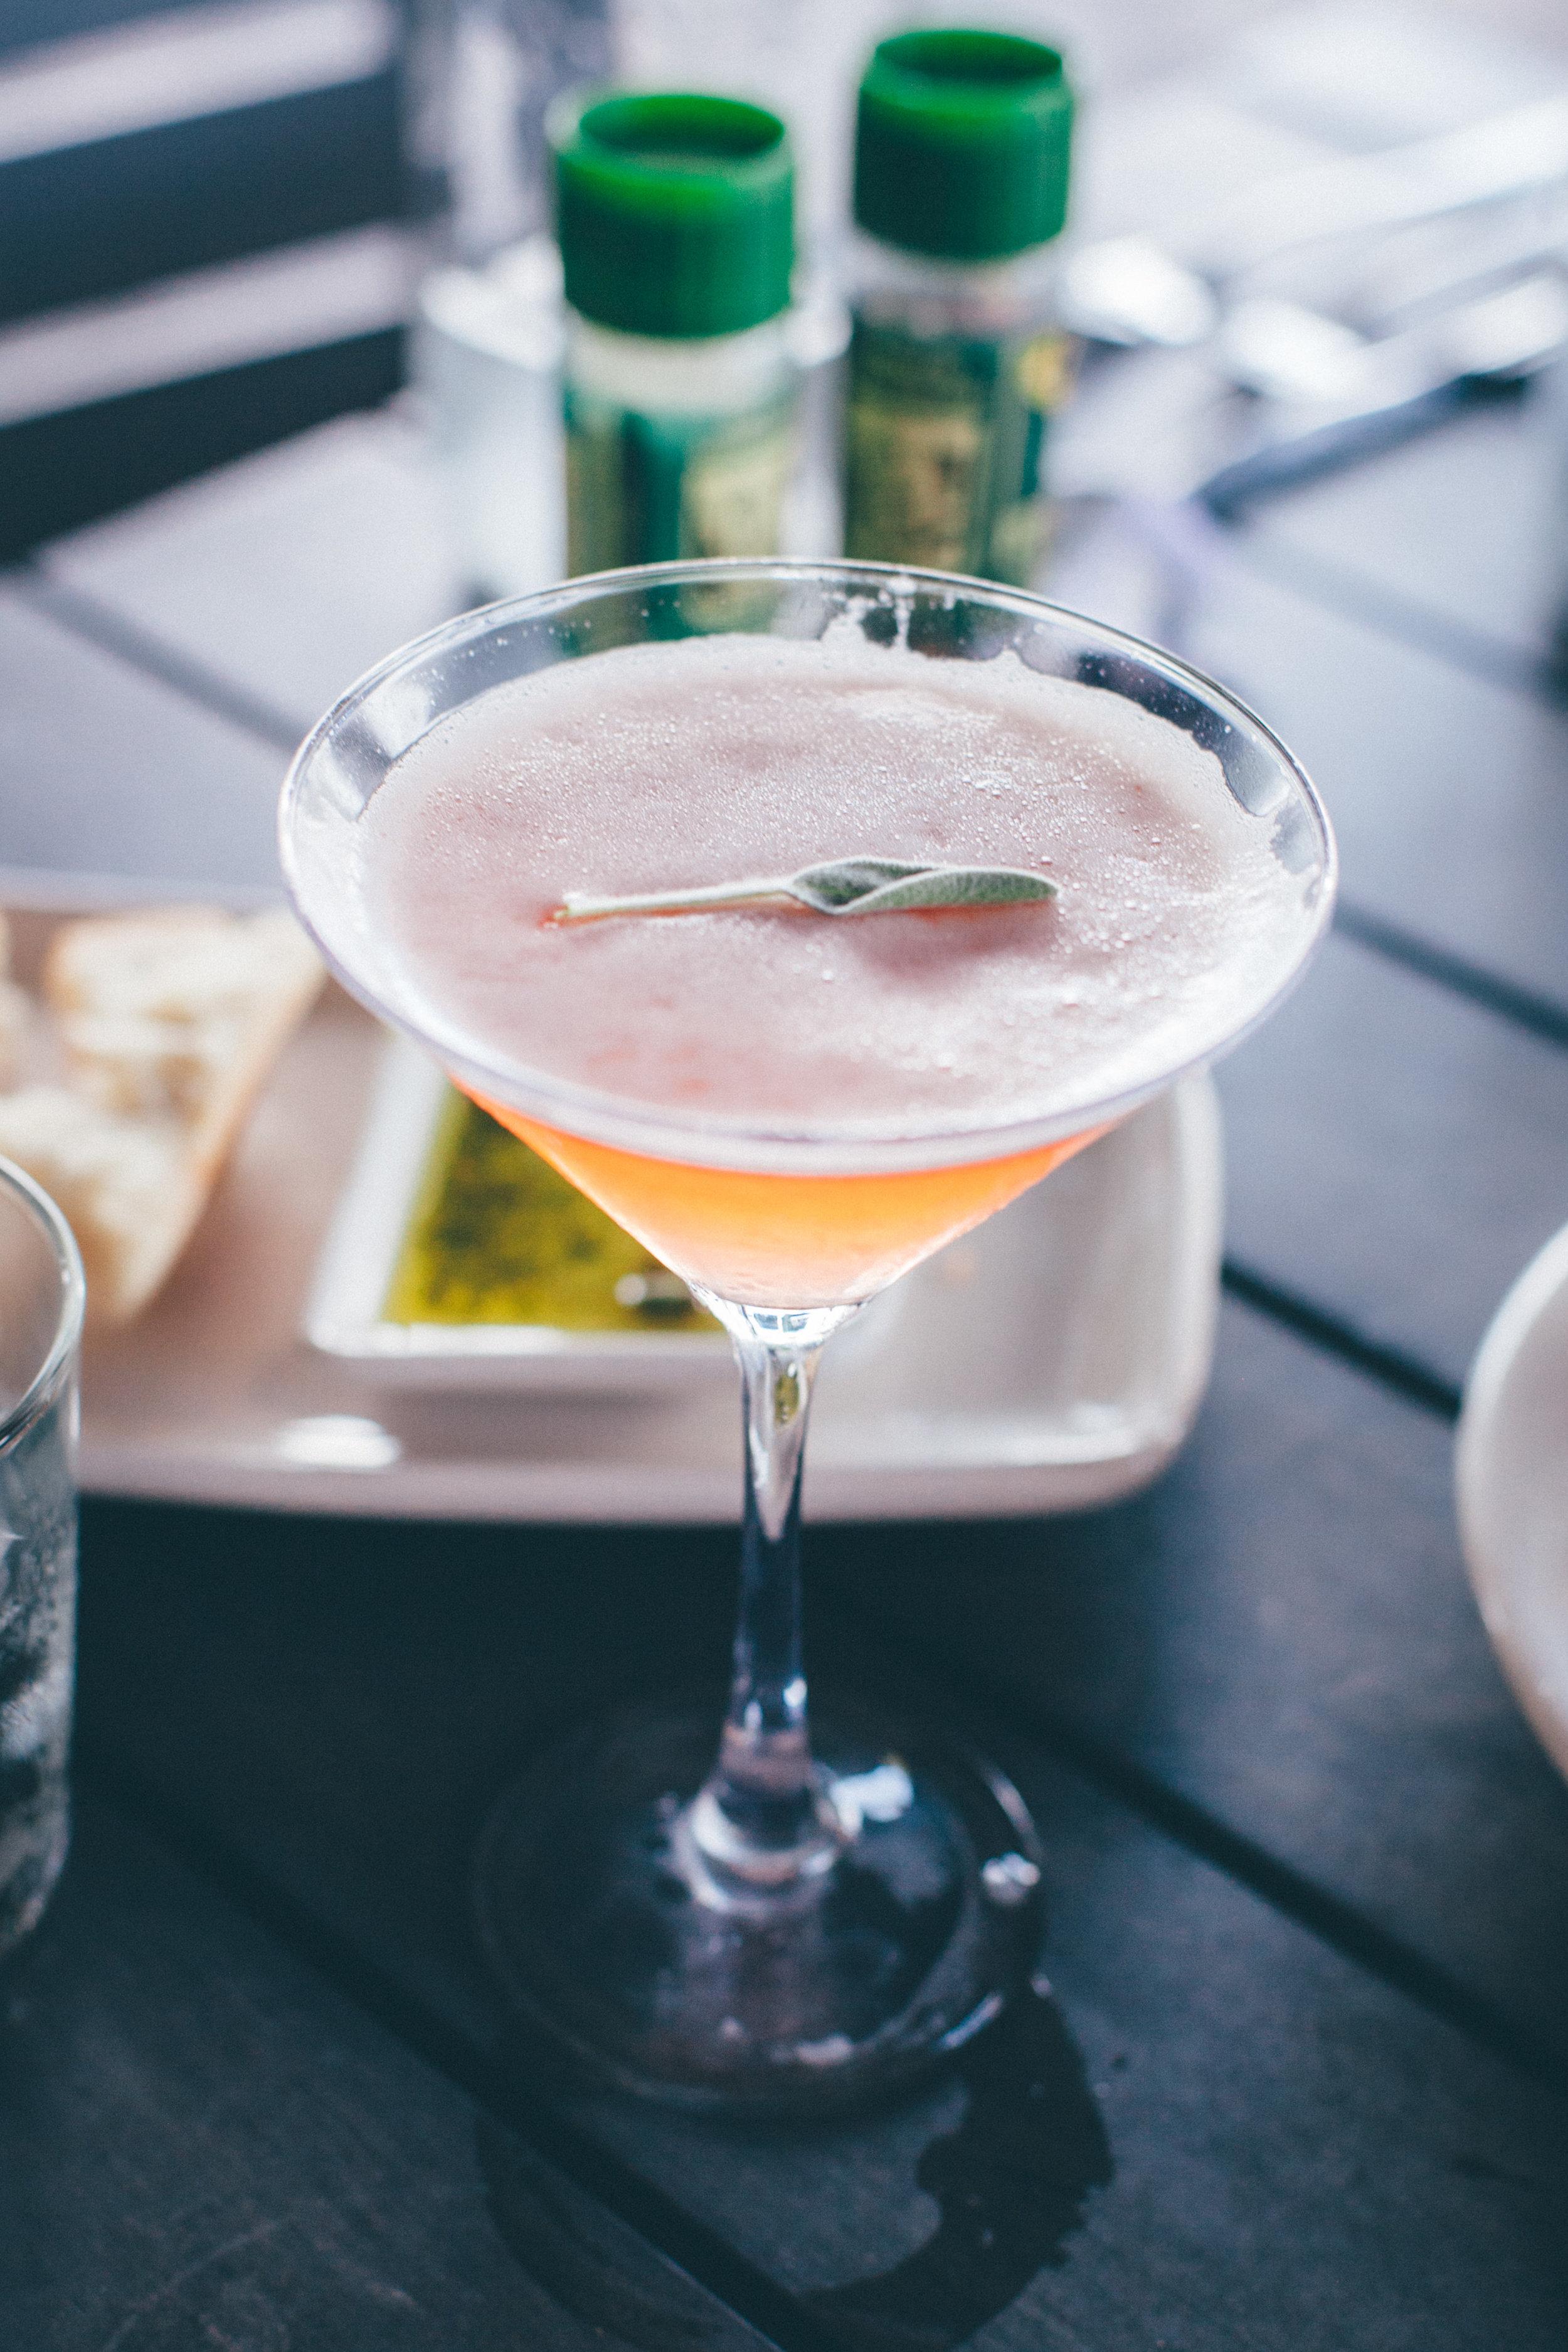 Pomegranate & Sage Martini:Reyka small-batch vodka, a hint of sage, 100% pomegranate juice & fresh lemon juice, finished with a fresh sage leaf